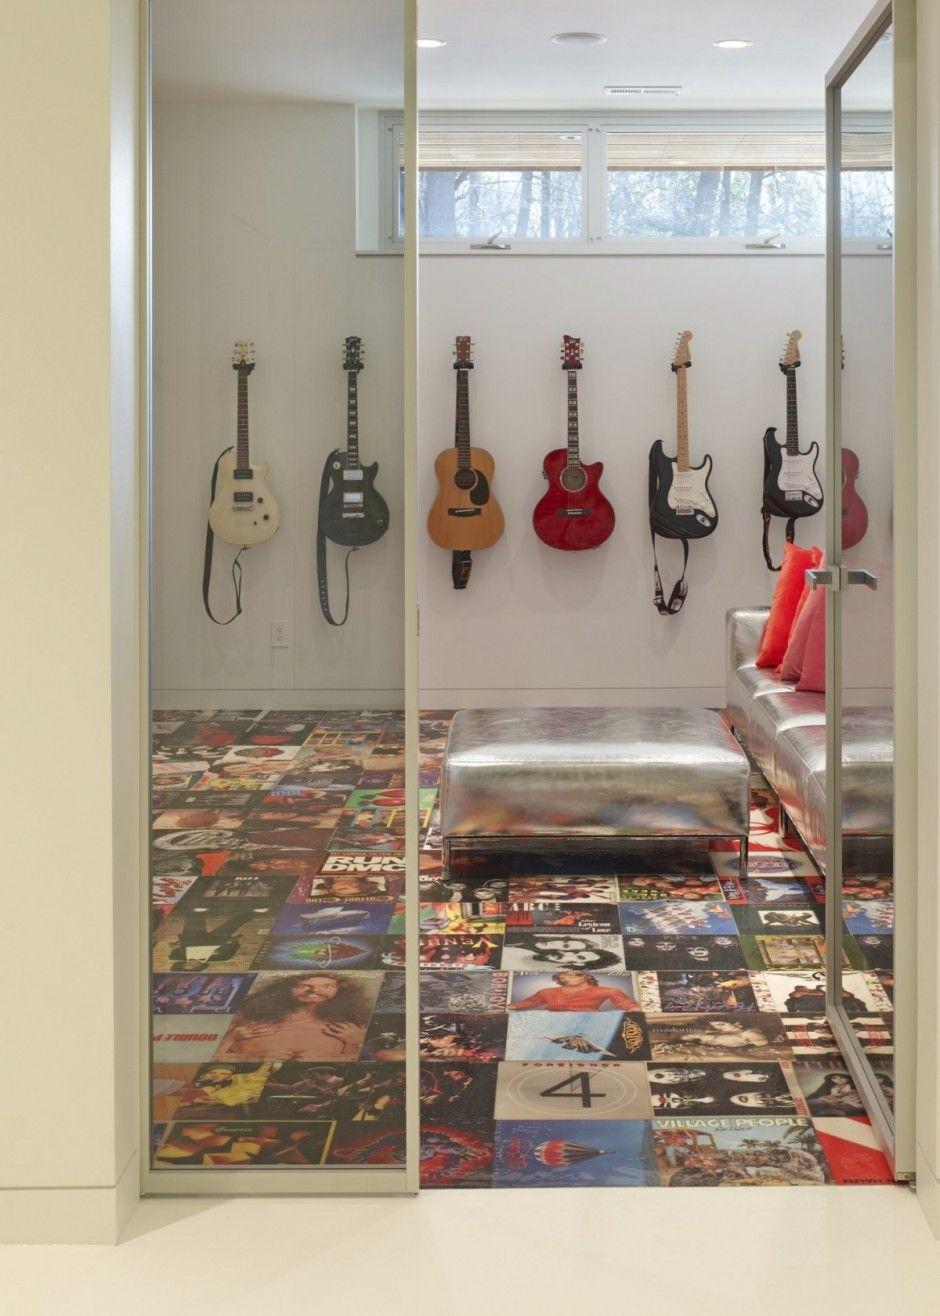 guitarras + rock 'n roll + vinis + couro prateado